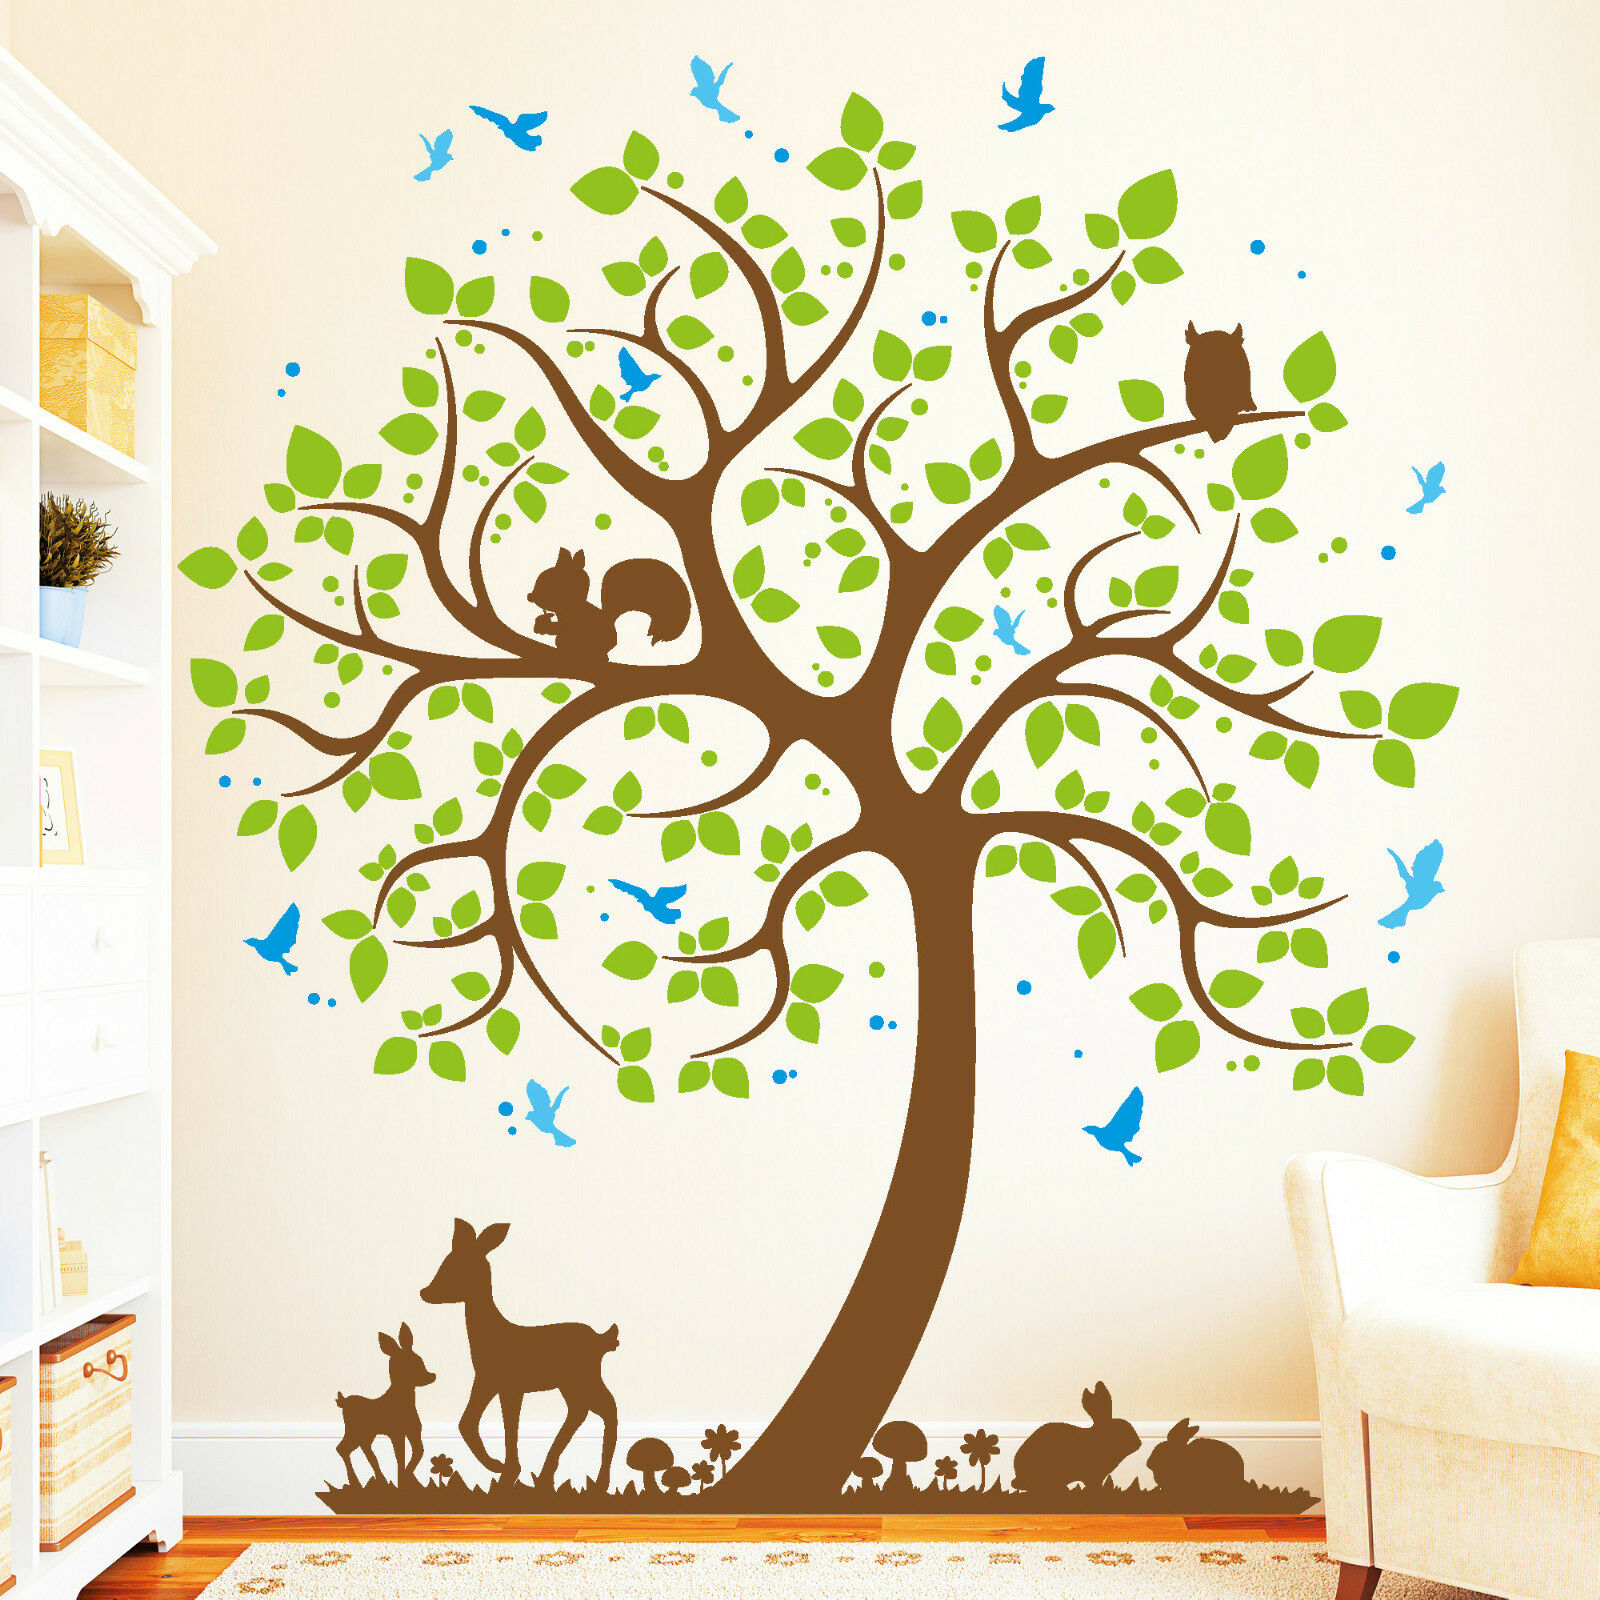 Wandtattoo Loft Baum Hase Rehkitz Vogel (4farbig)   Wandaufkleber Owl Uhu 10977